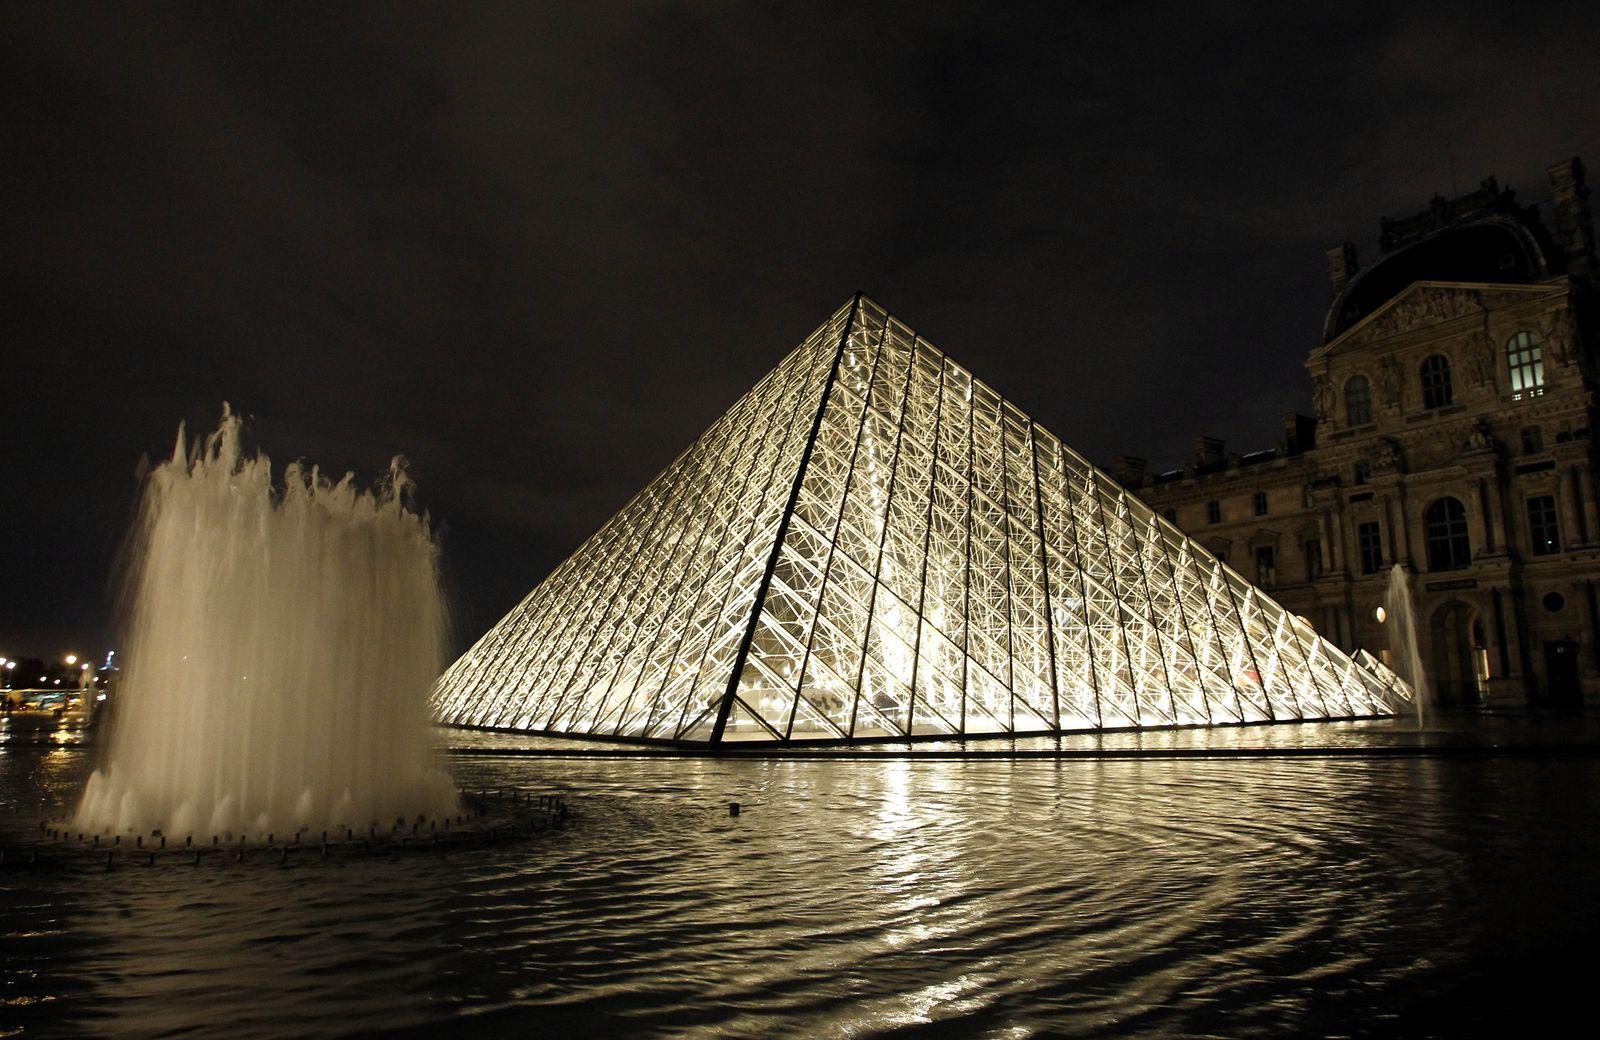 Leoh Ming Pei/ 100.Geburstag/ Louvre